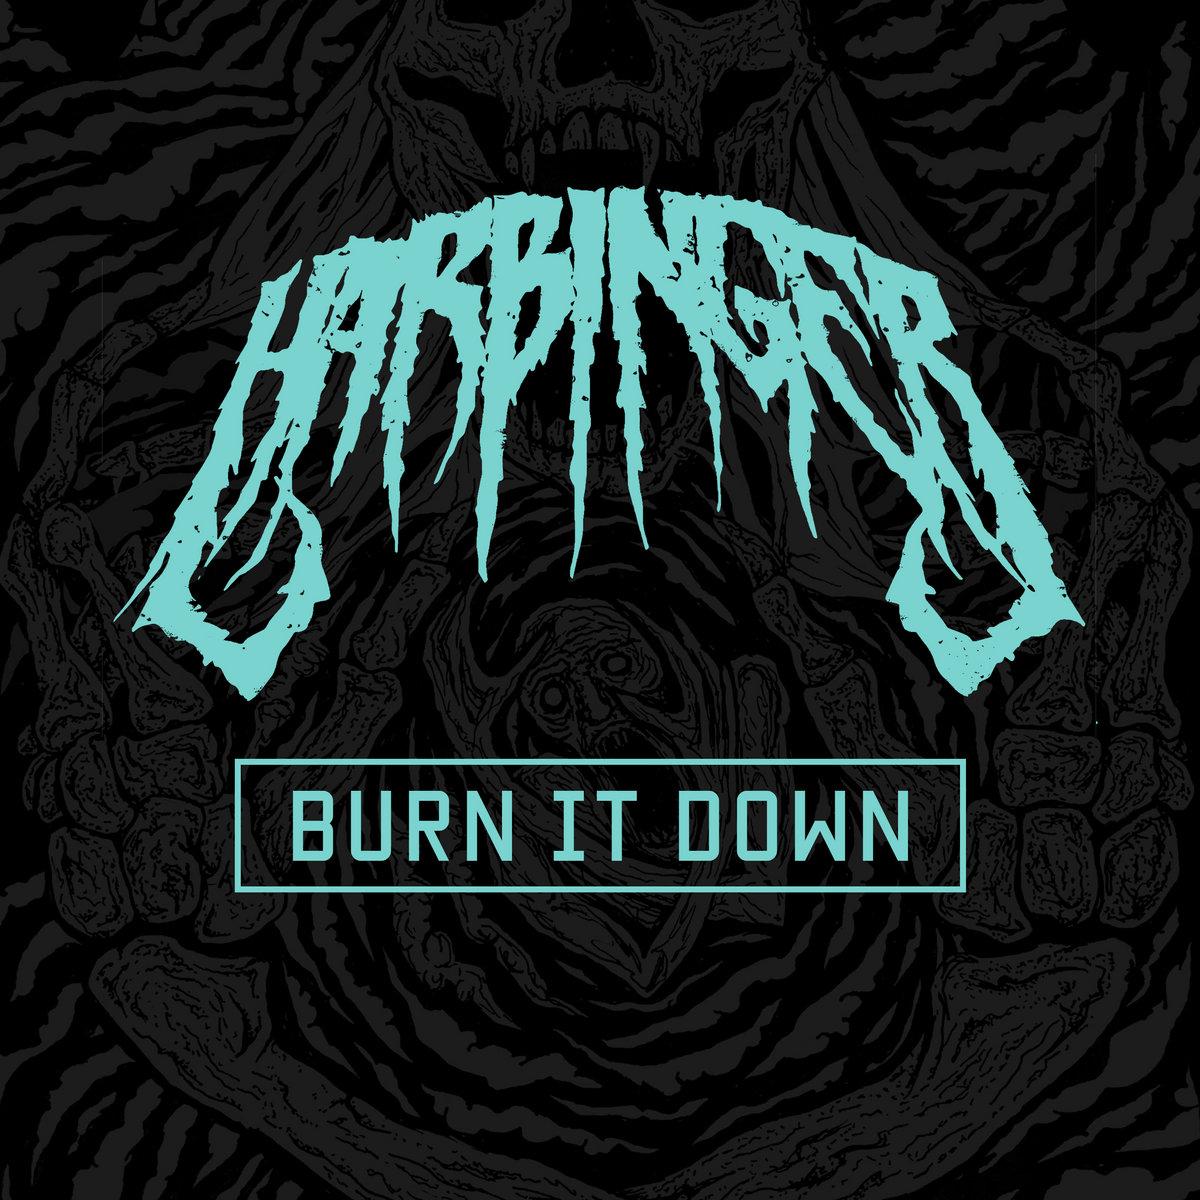 burn it down avenged